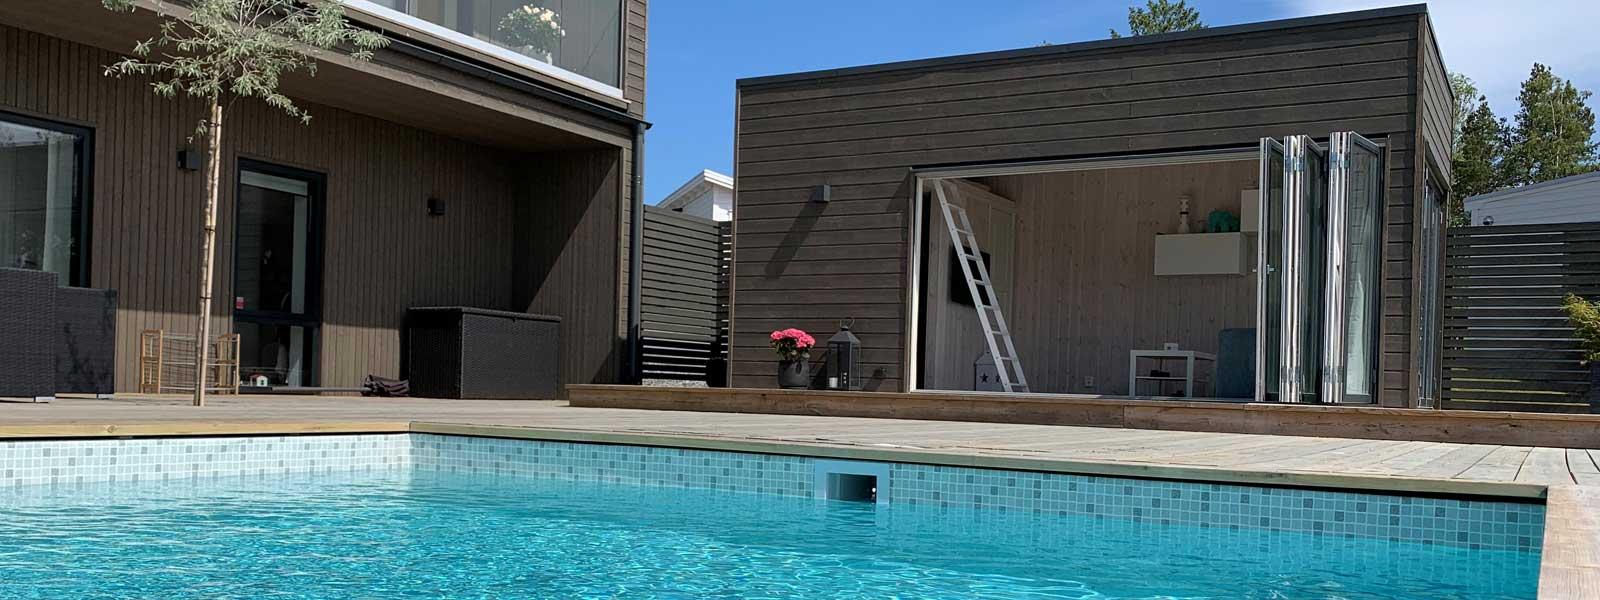 Pool hus